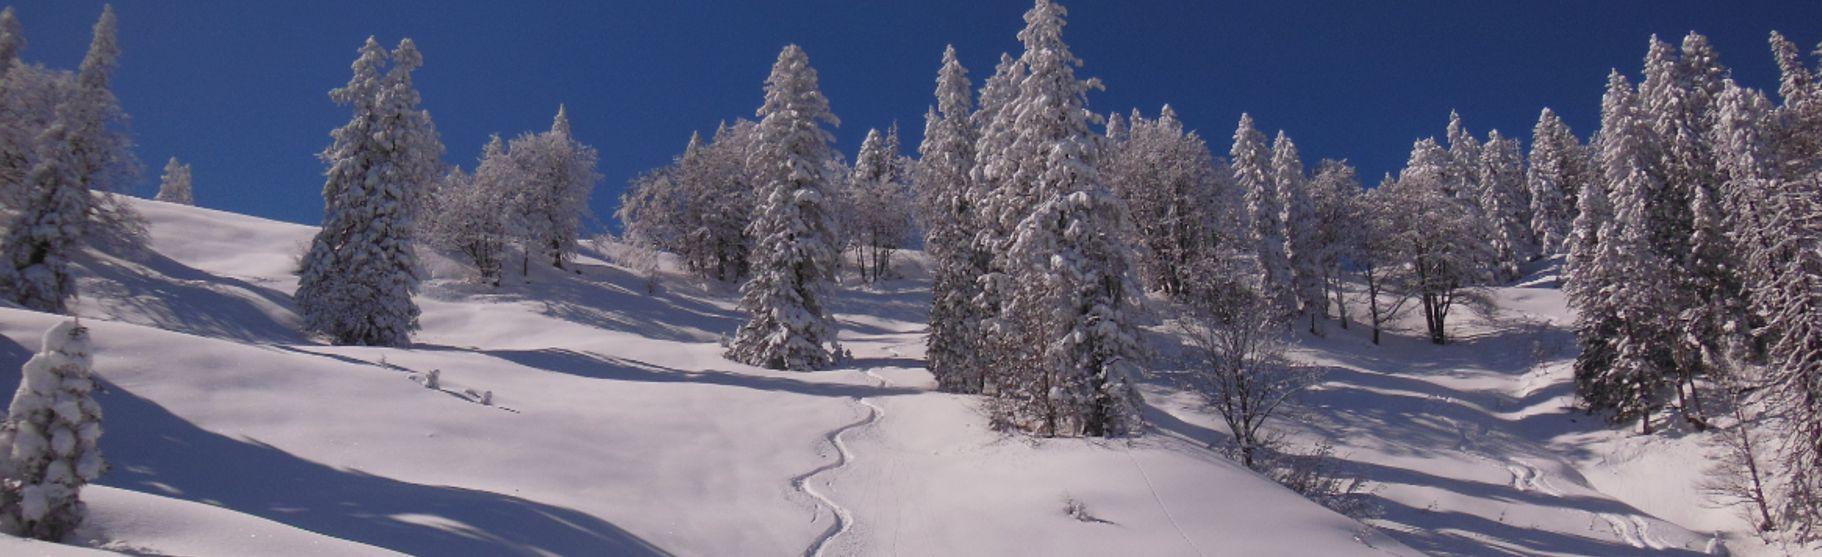 waldpiste-winter.jpg